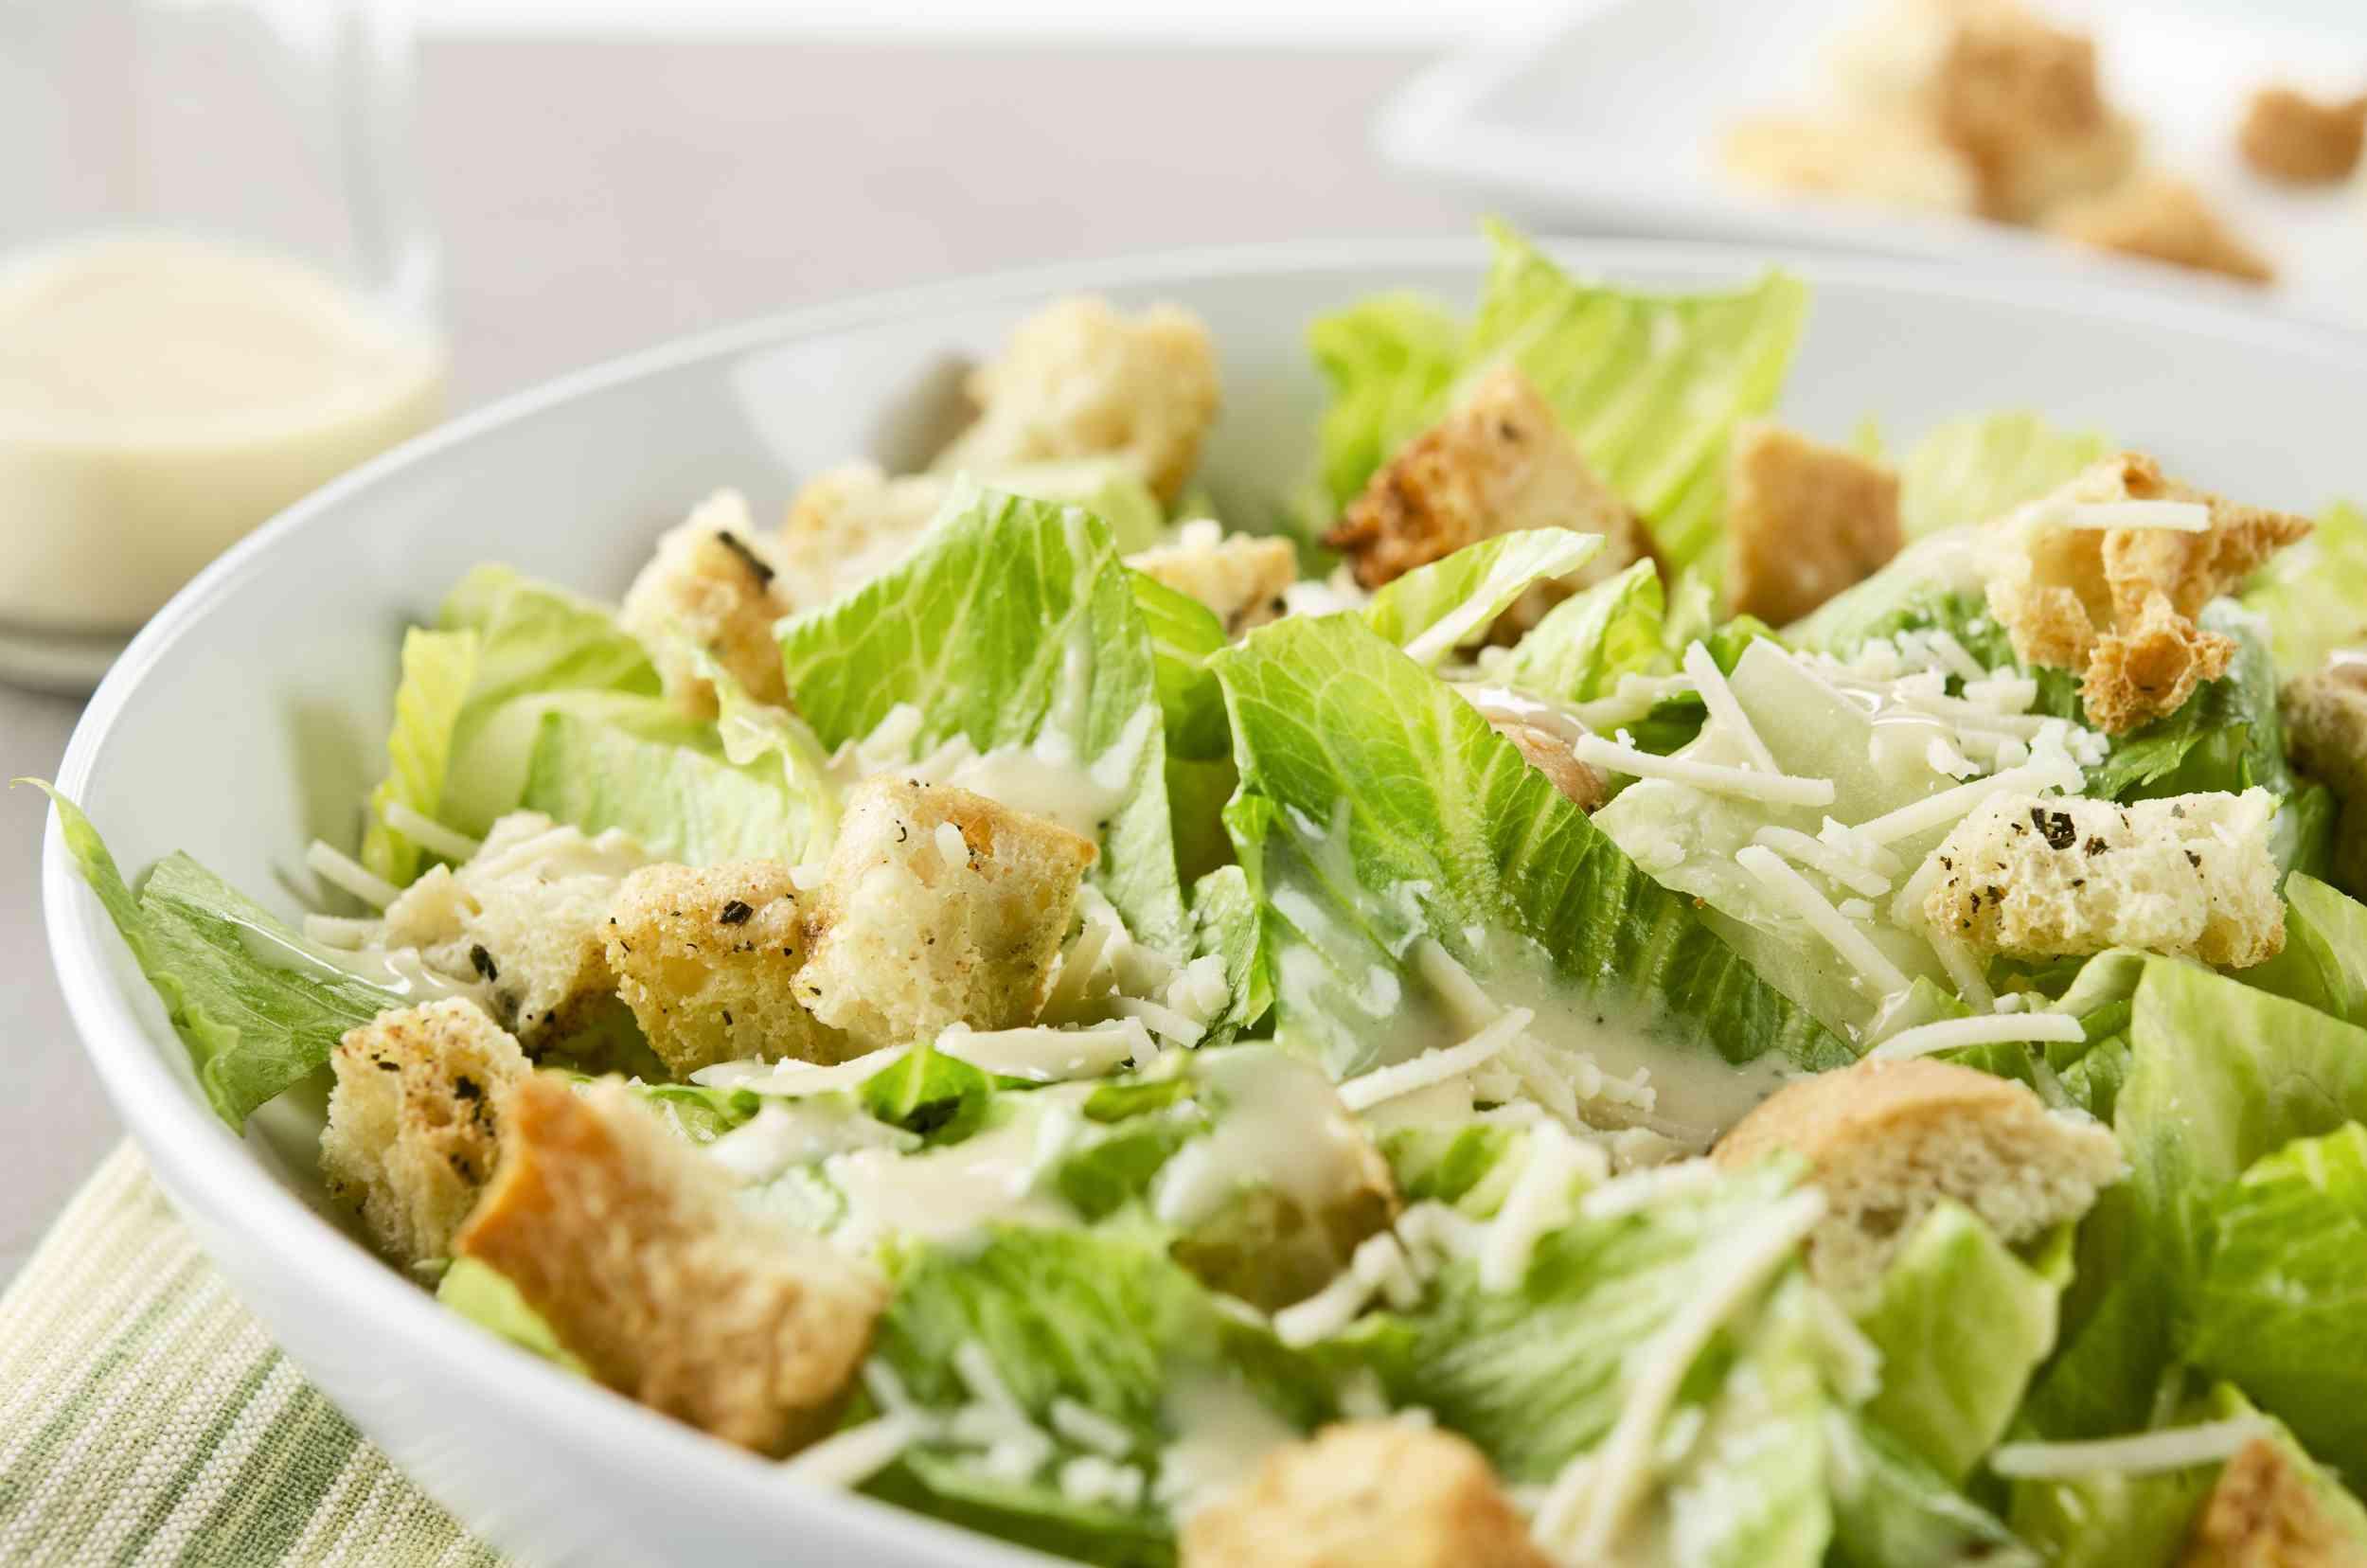 Risultati immagini per cesar salad